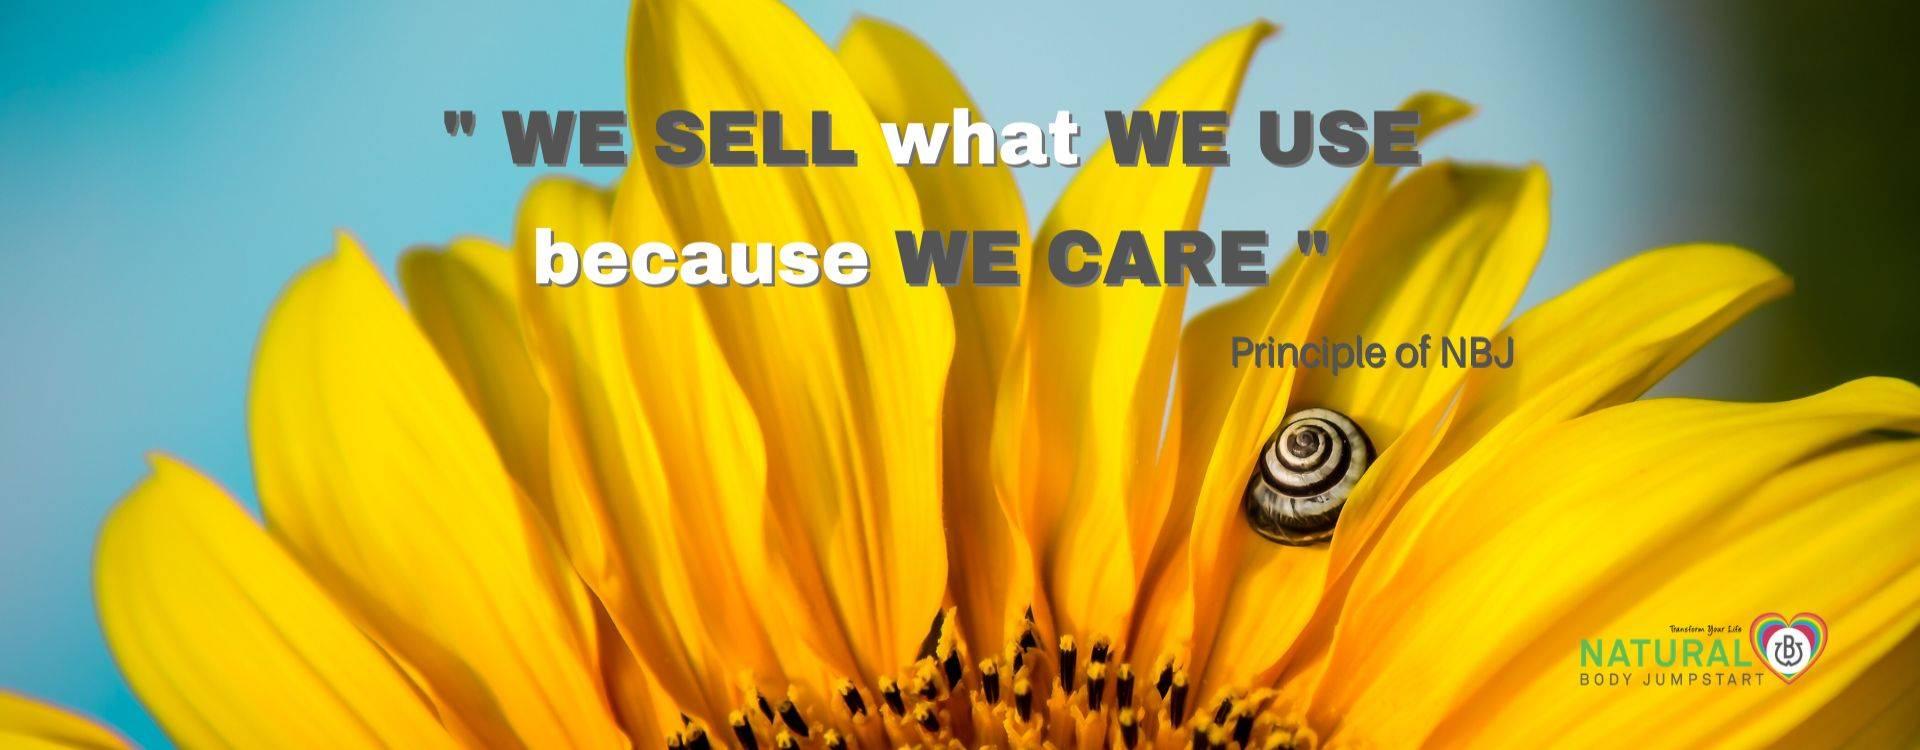 We Sell We Use We Care (bulkresize to 1920x750px)